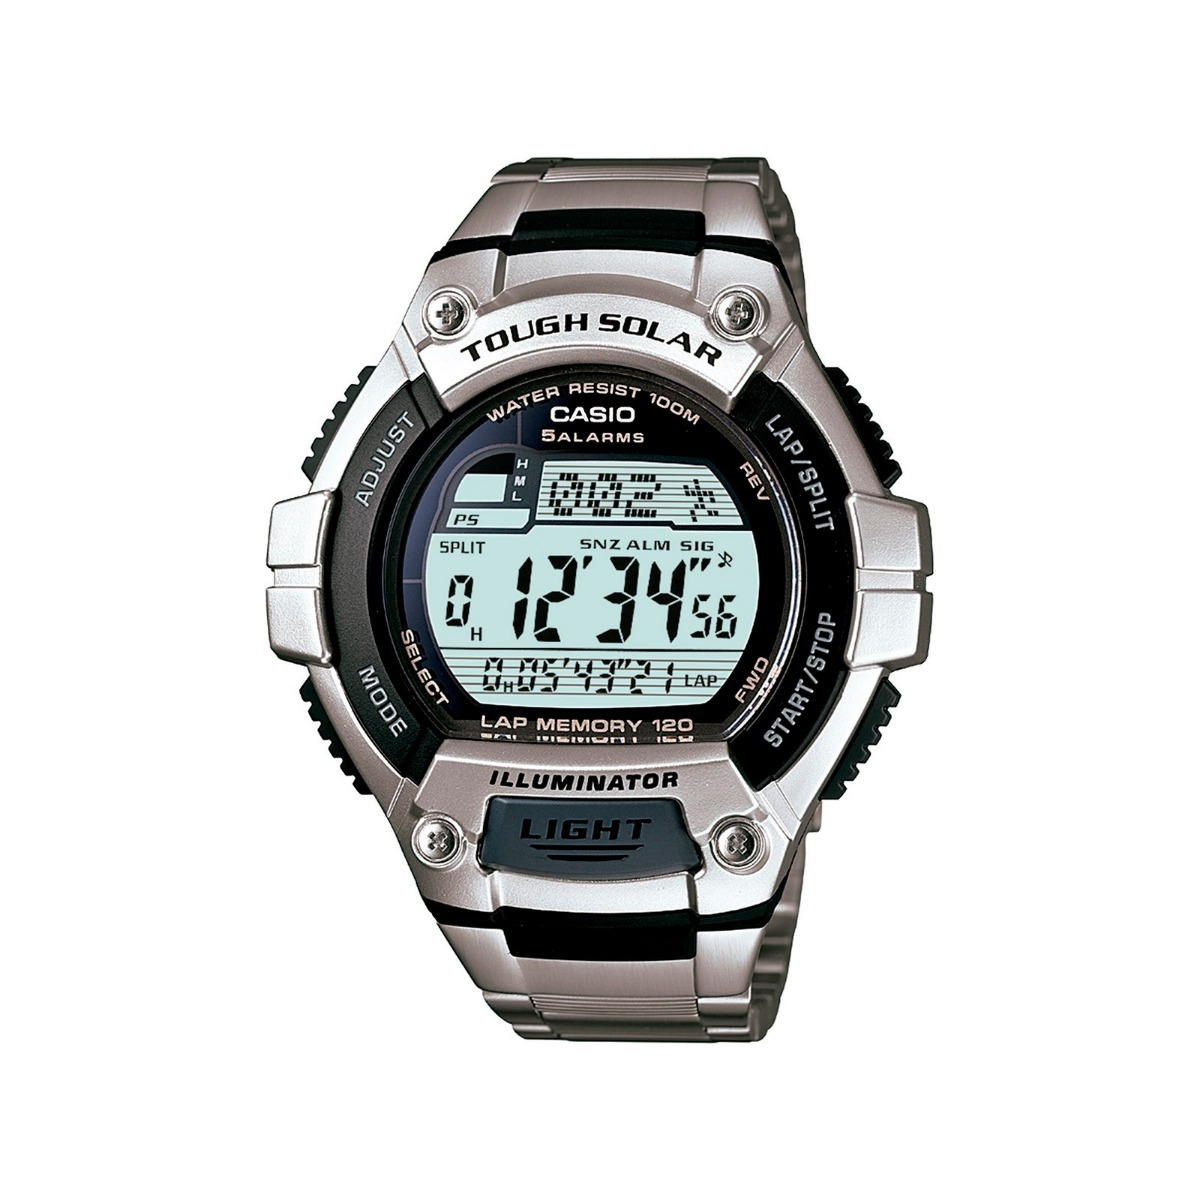 71f5f191424 Relógio Masculino Casio W-s220d-1av Original Solar Esportes - R  214 ...